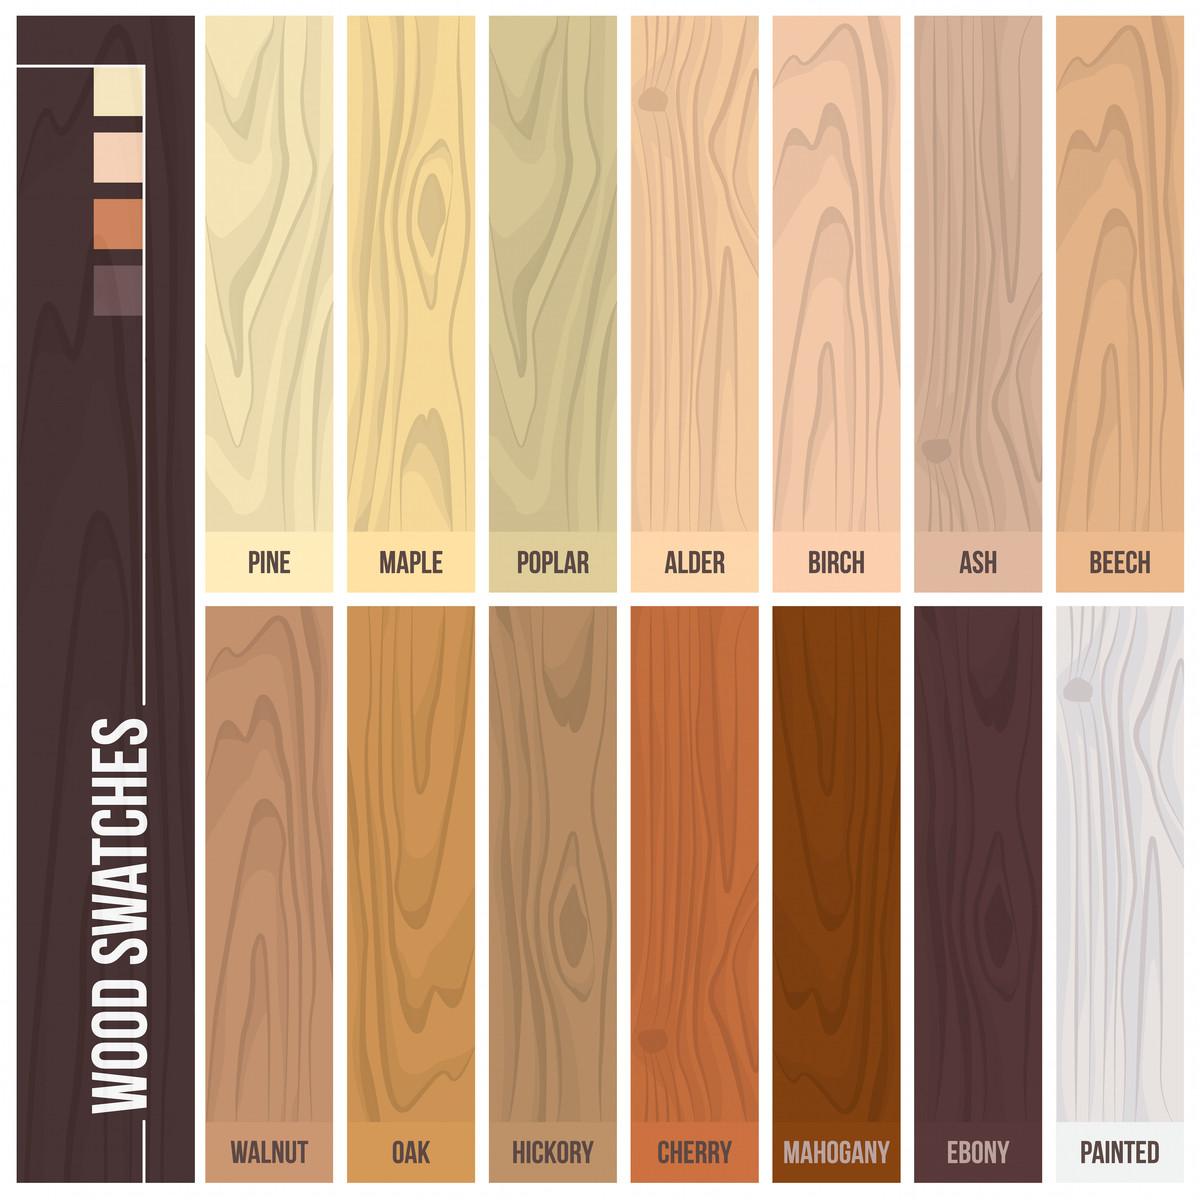 how to install hardwood floors of 12 types of hardwood flooring species styles edging dimensions with regard to types of hardwood flooring illustrated guide